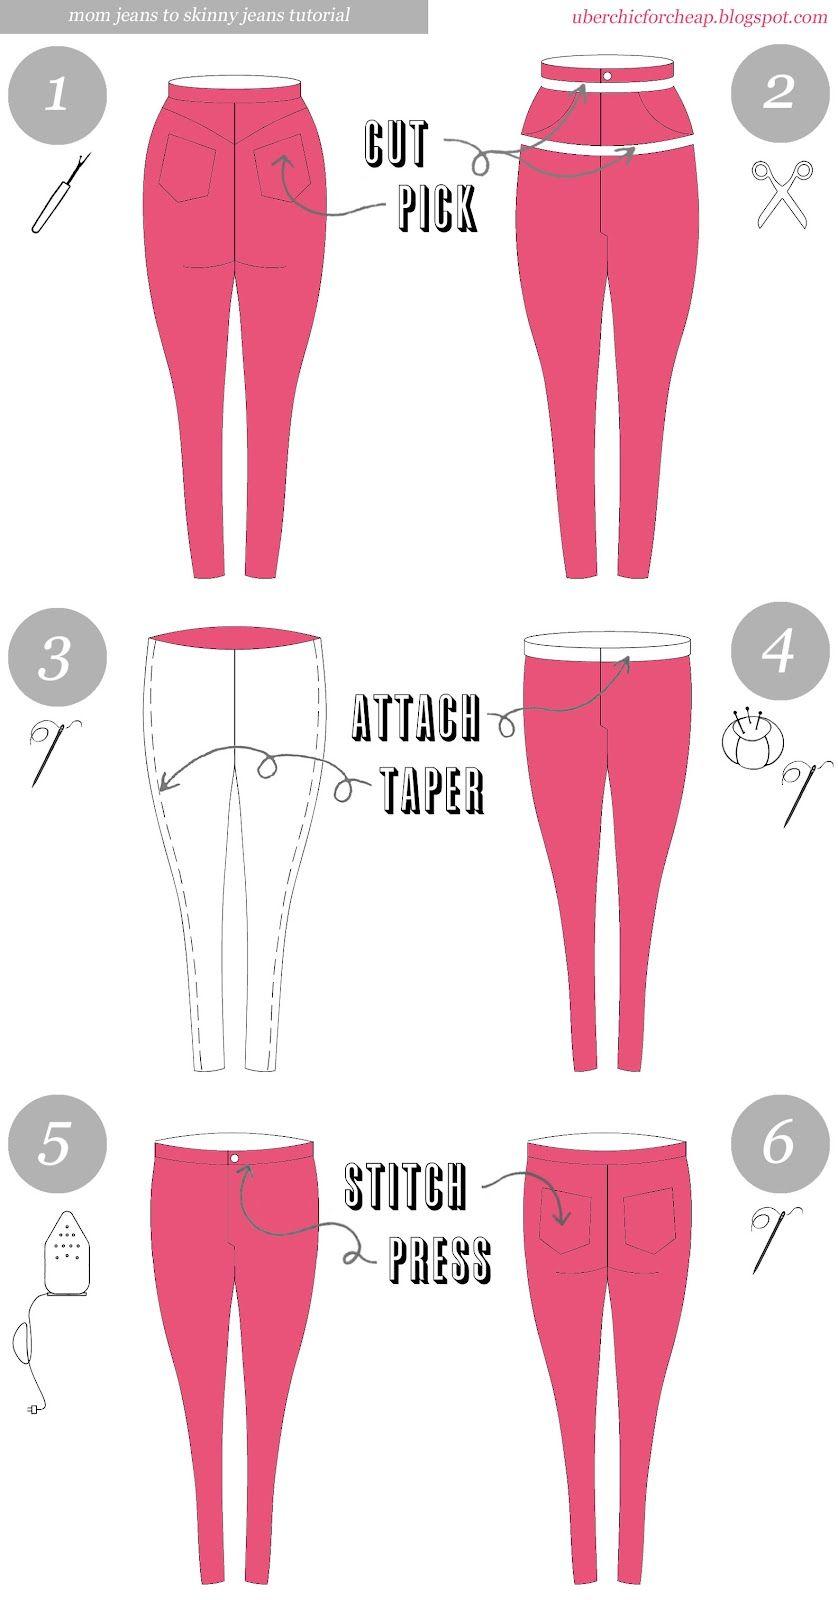 Über Chic más barato: Tutorial: Jeans Skinny Jeans a mamá | Mujer ...